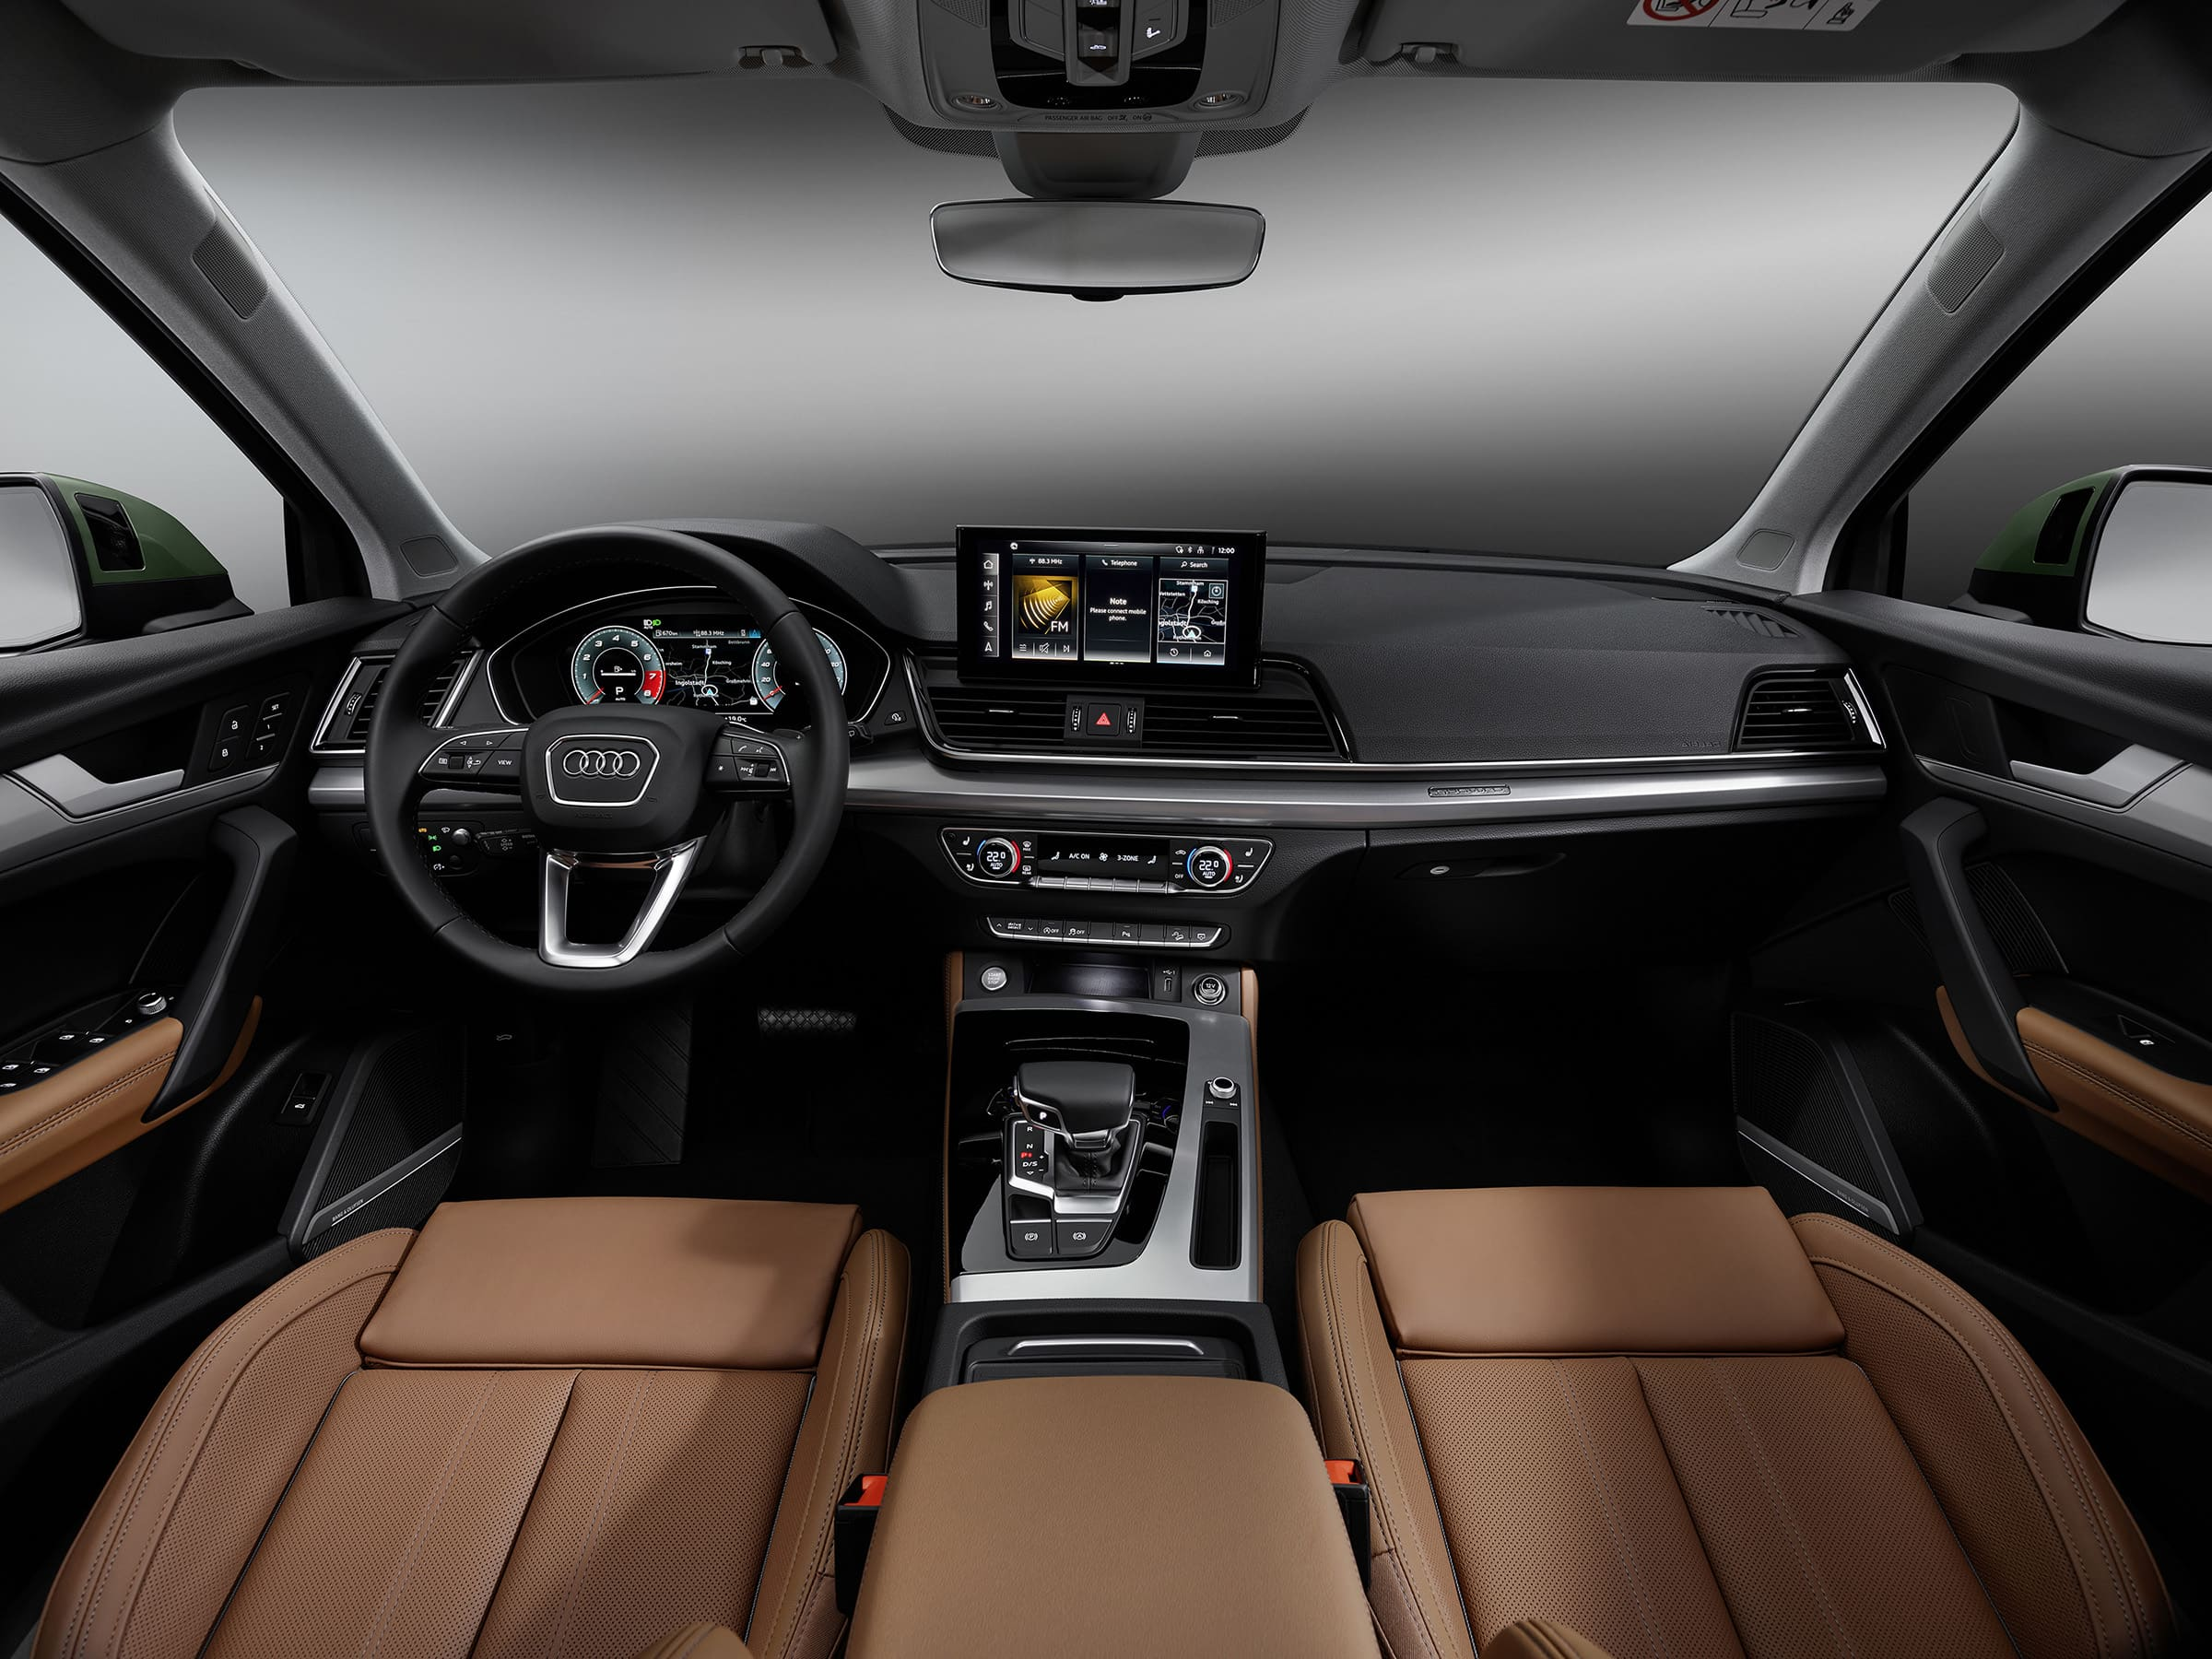 Infotainment και Audi connect για κορυφαία συνδεσιμότητα στο Audi Q5